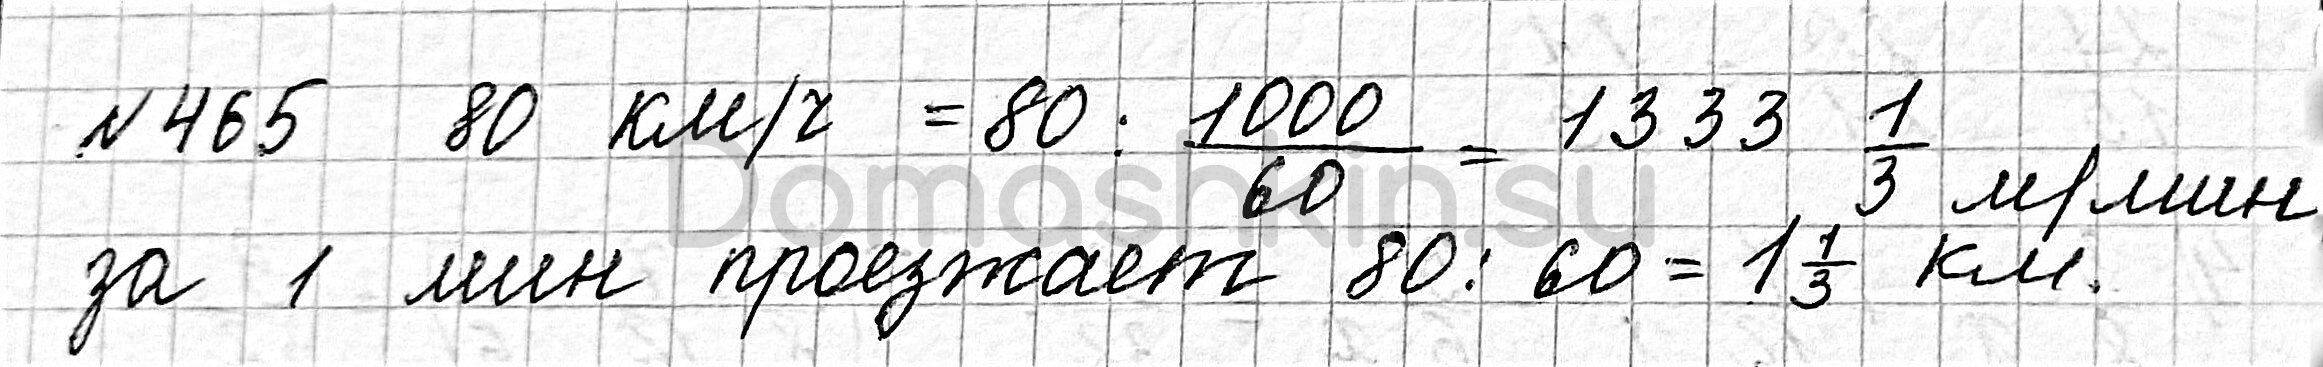 Математика 6 класс учебник Мерзляк номер 465 решение